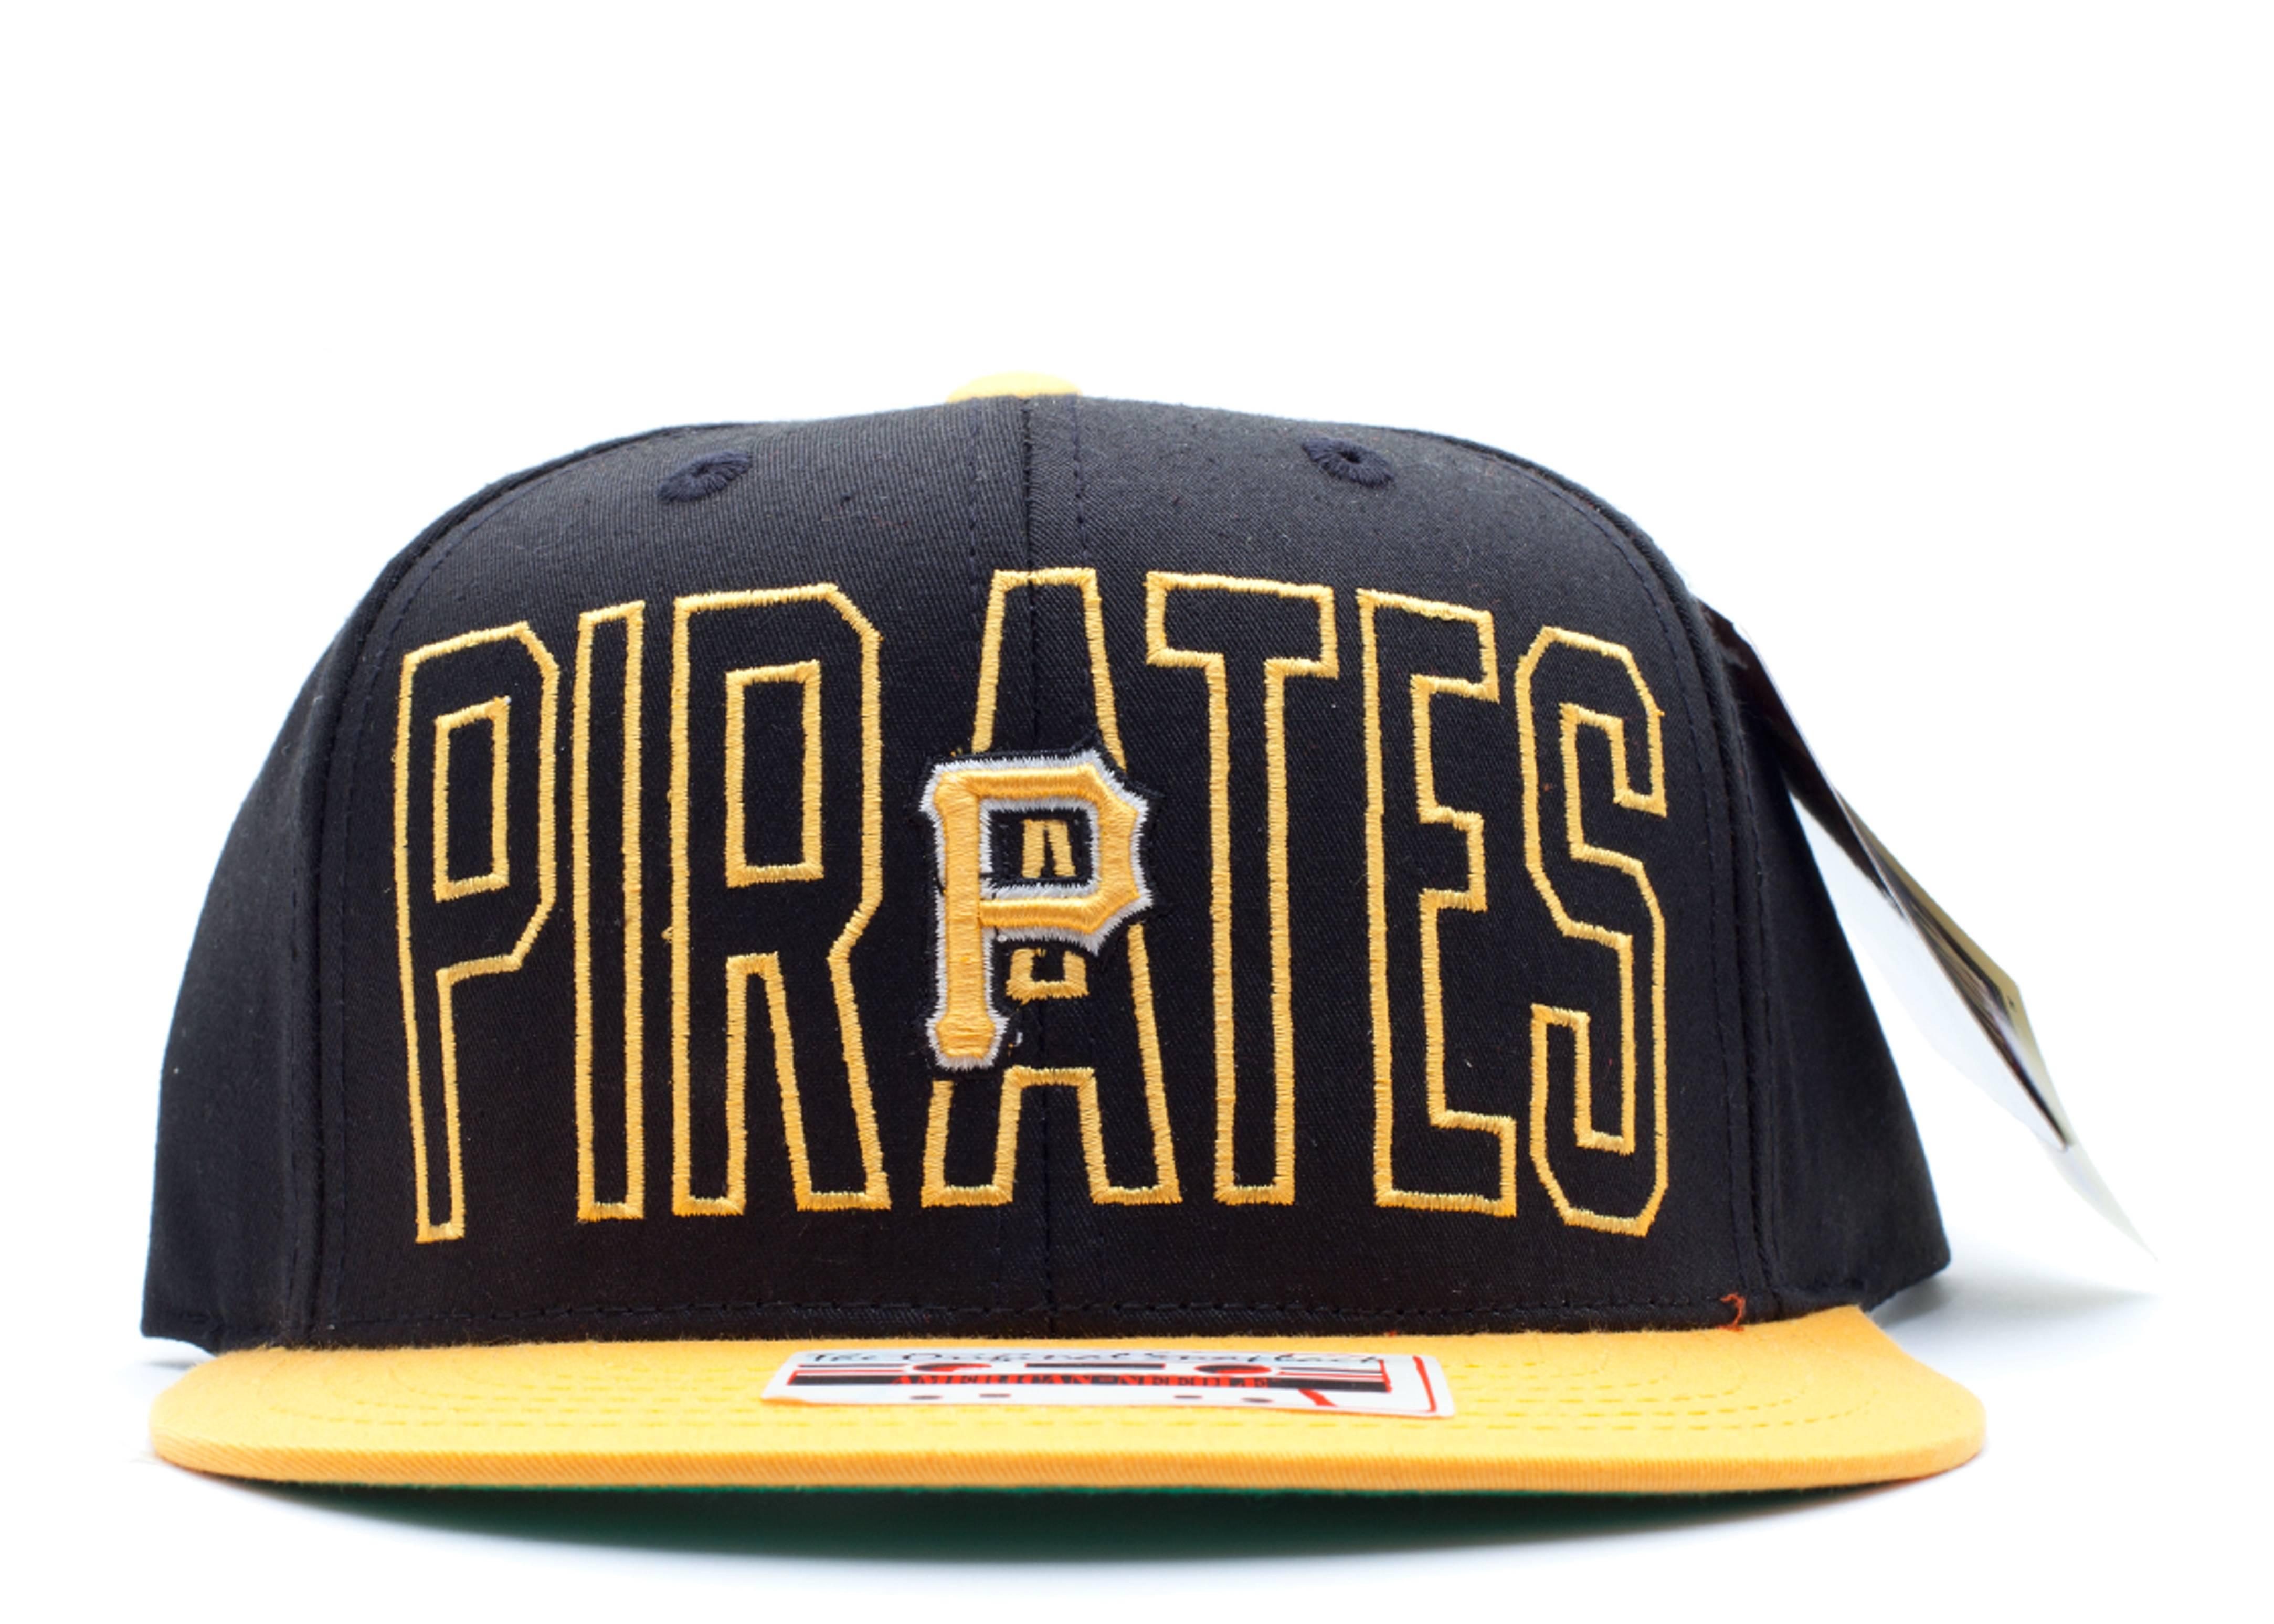 pittsburgh pirates snap-back